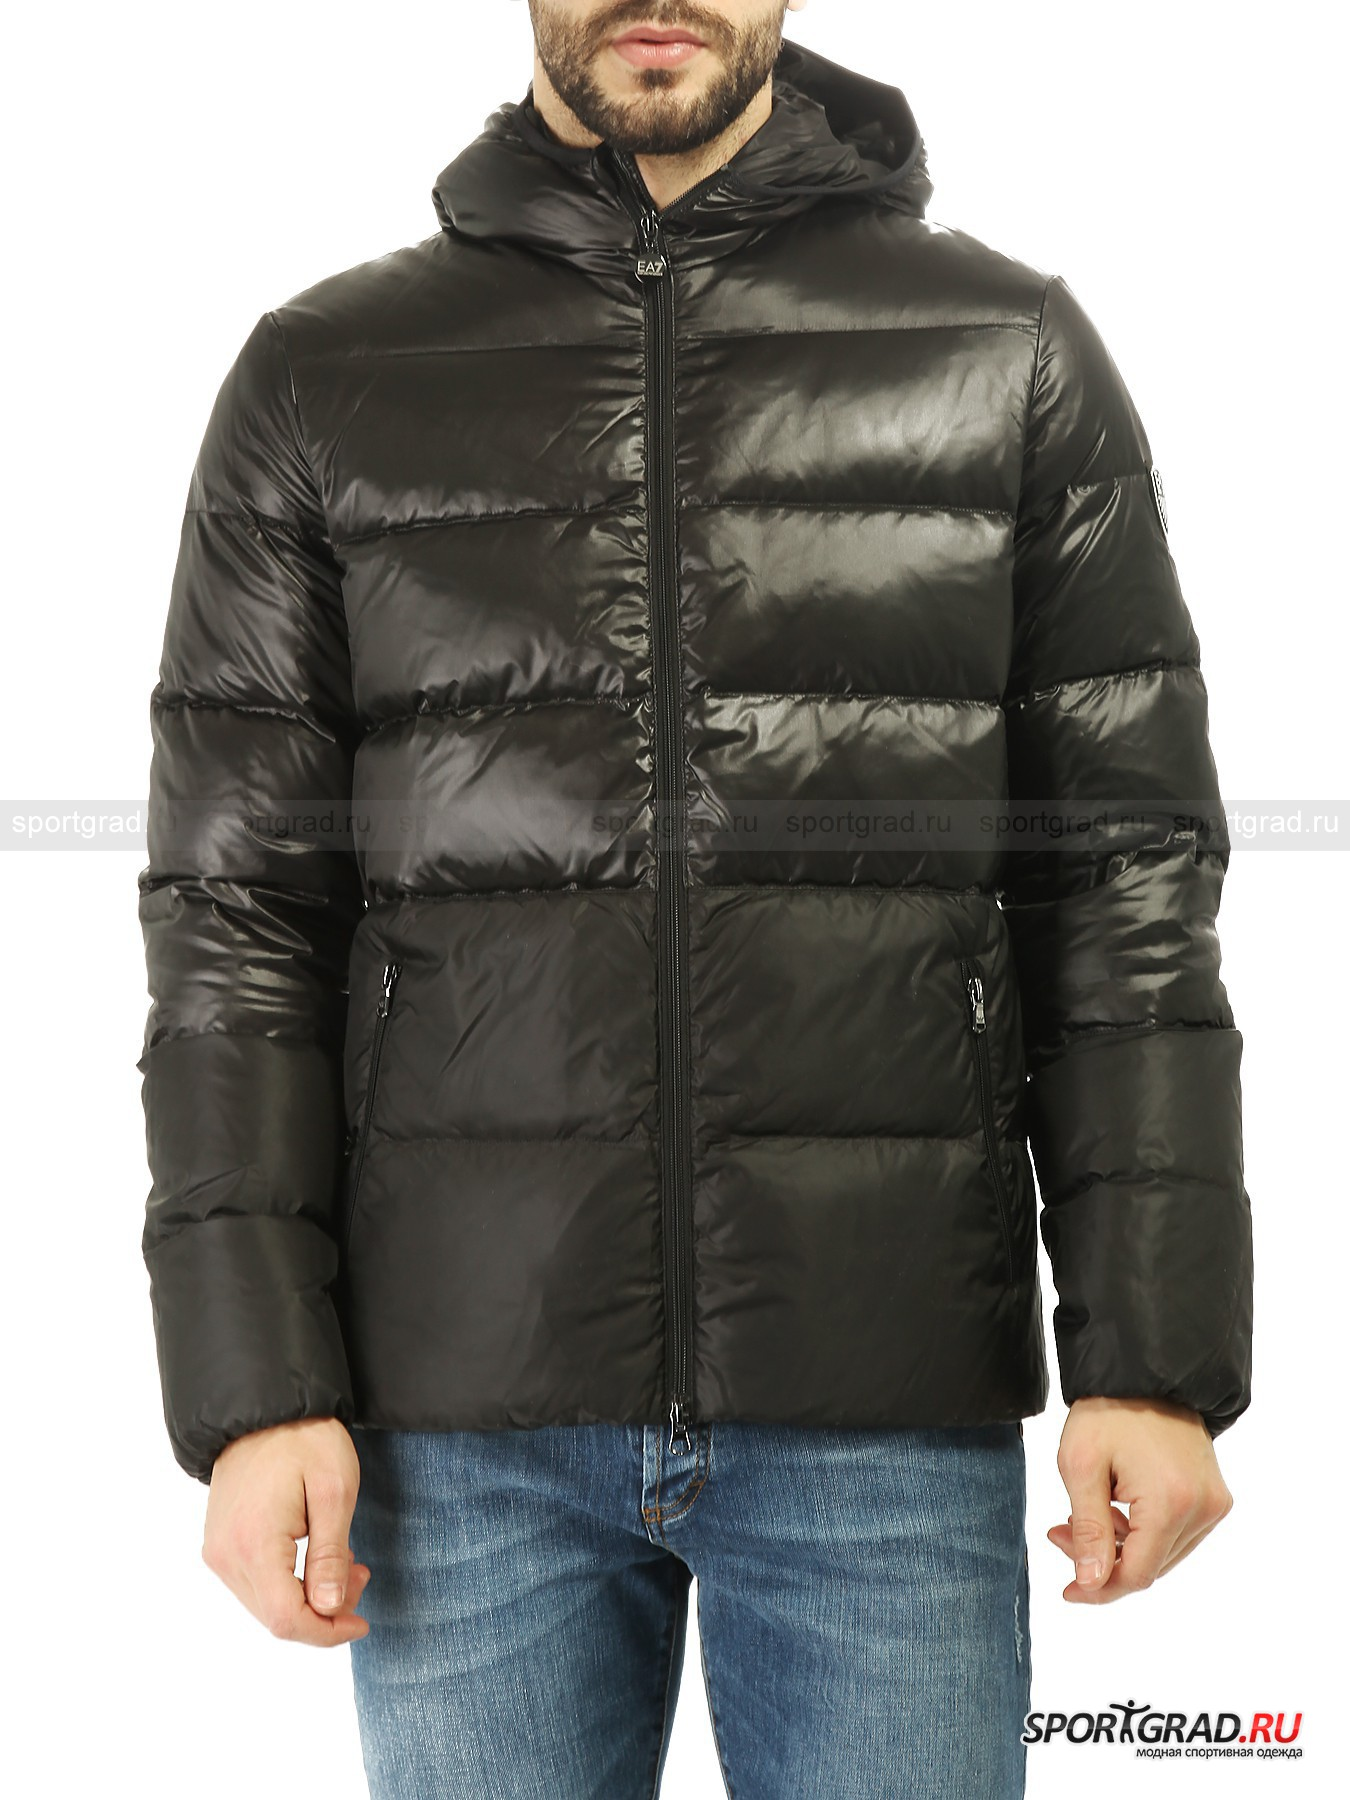 ������ ������� Mountain Shiny Matt Down Jacket EA7 EMPORIO ARMANI